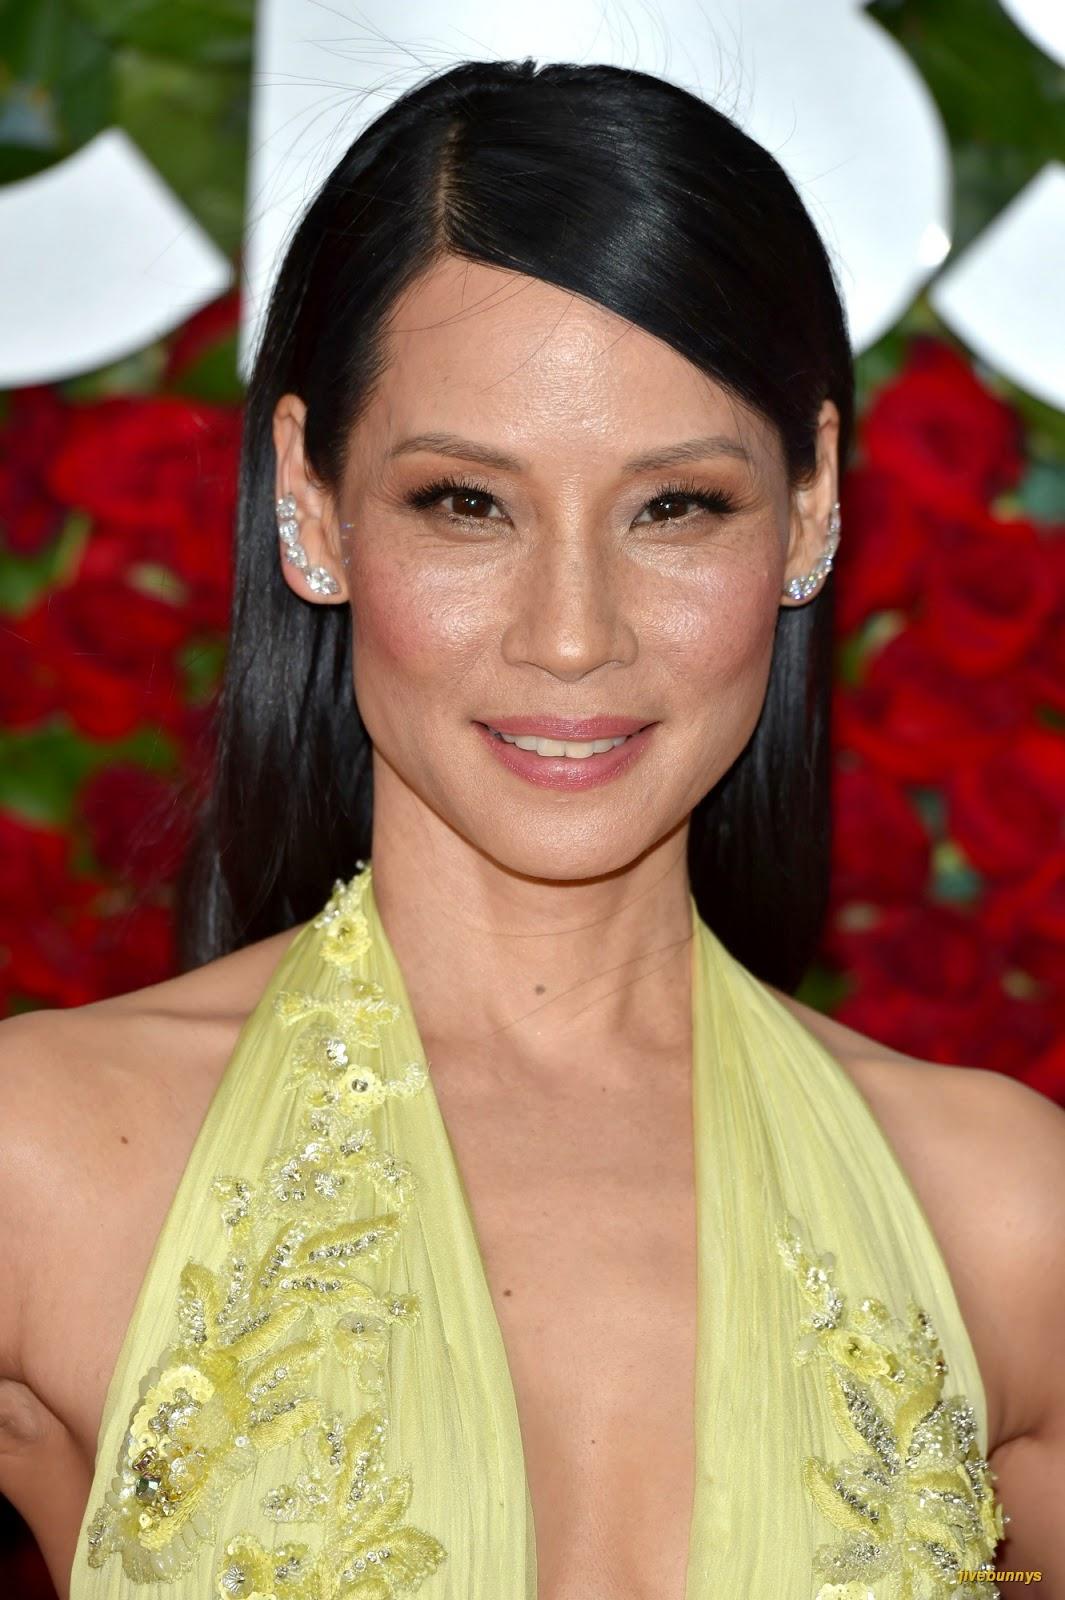 Jivebunnys Female Celebrity Picture Gallery: Lucy Liu Hot ... Jennifer Aniston Movies